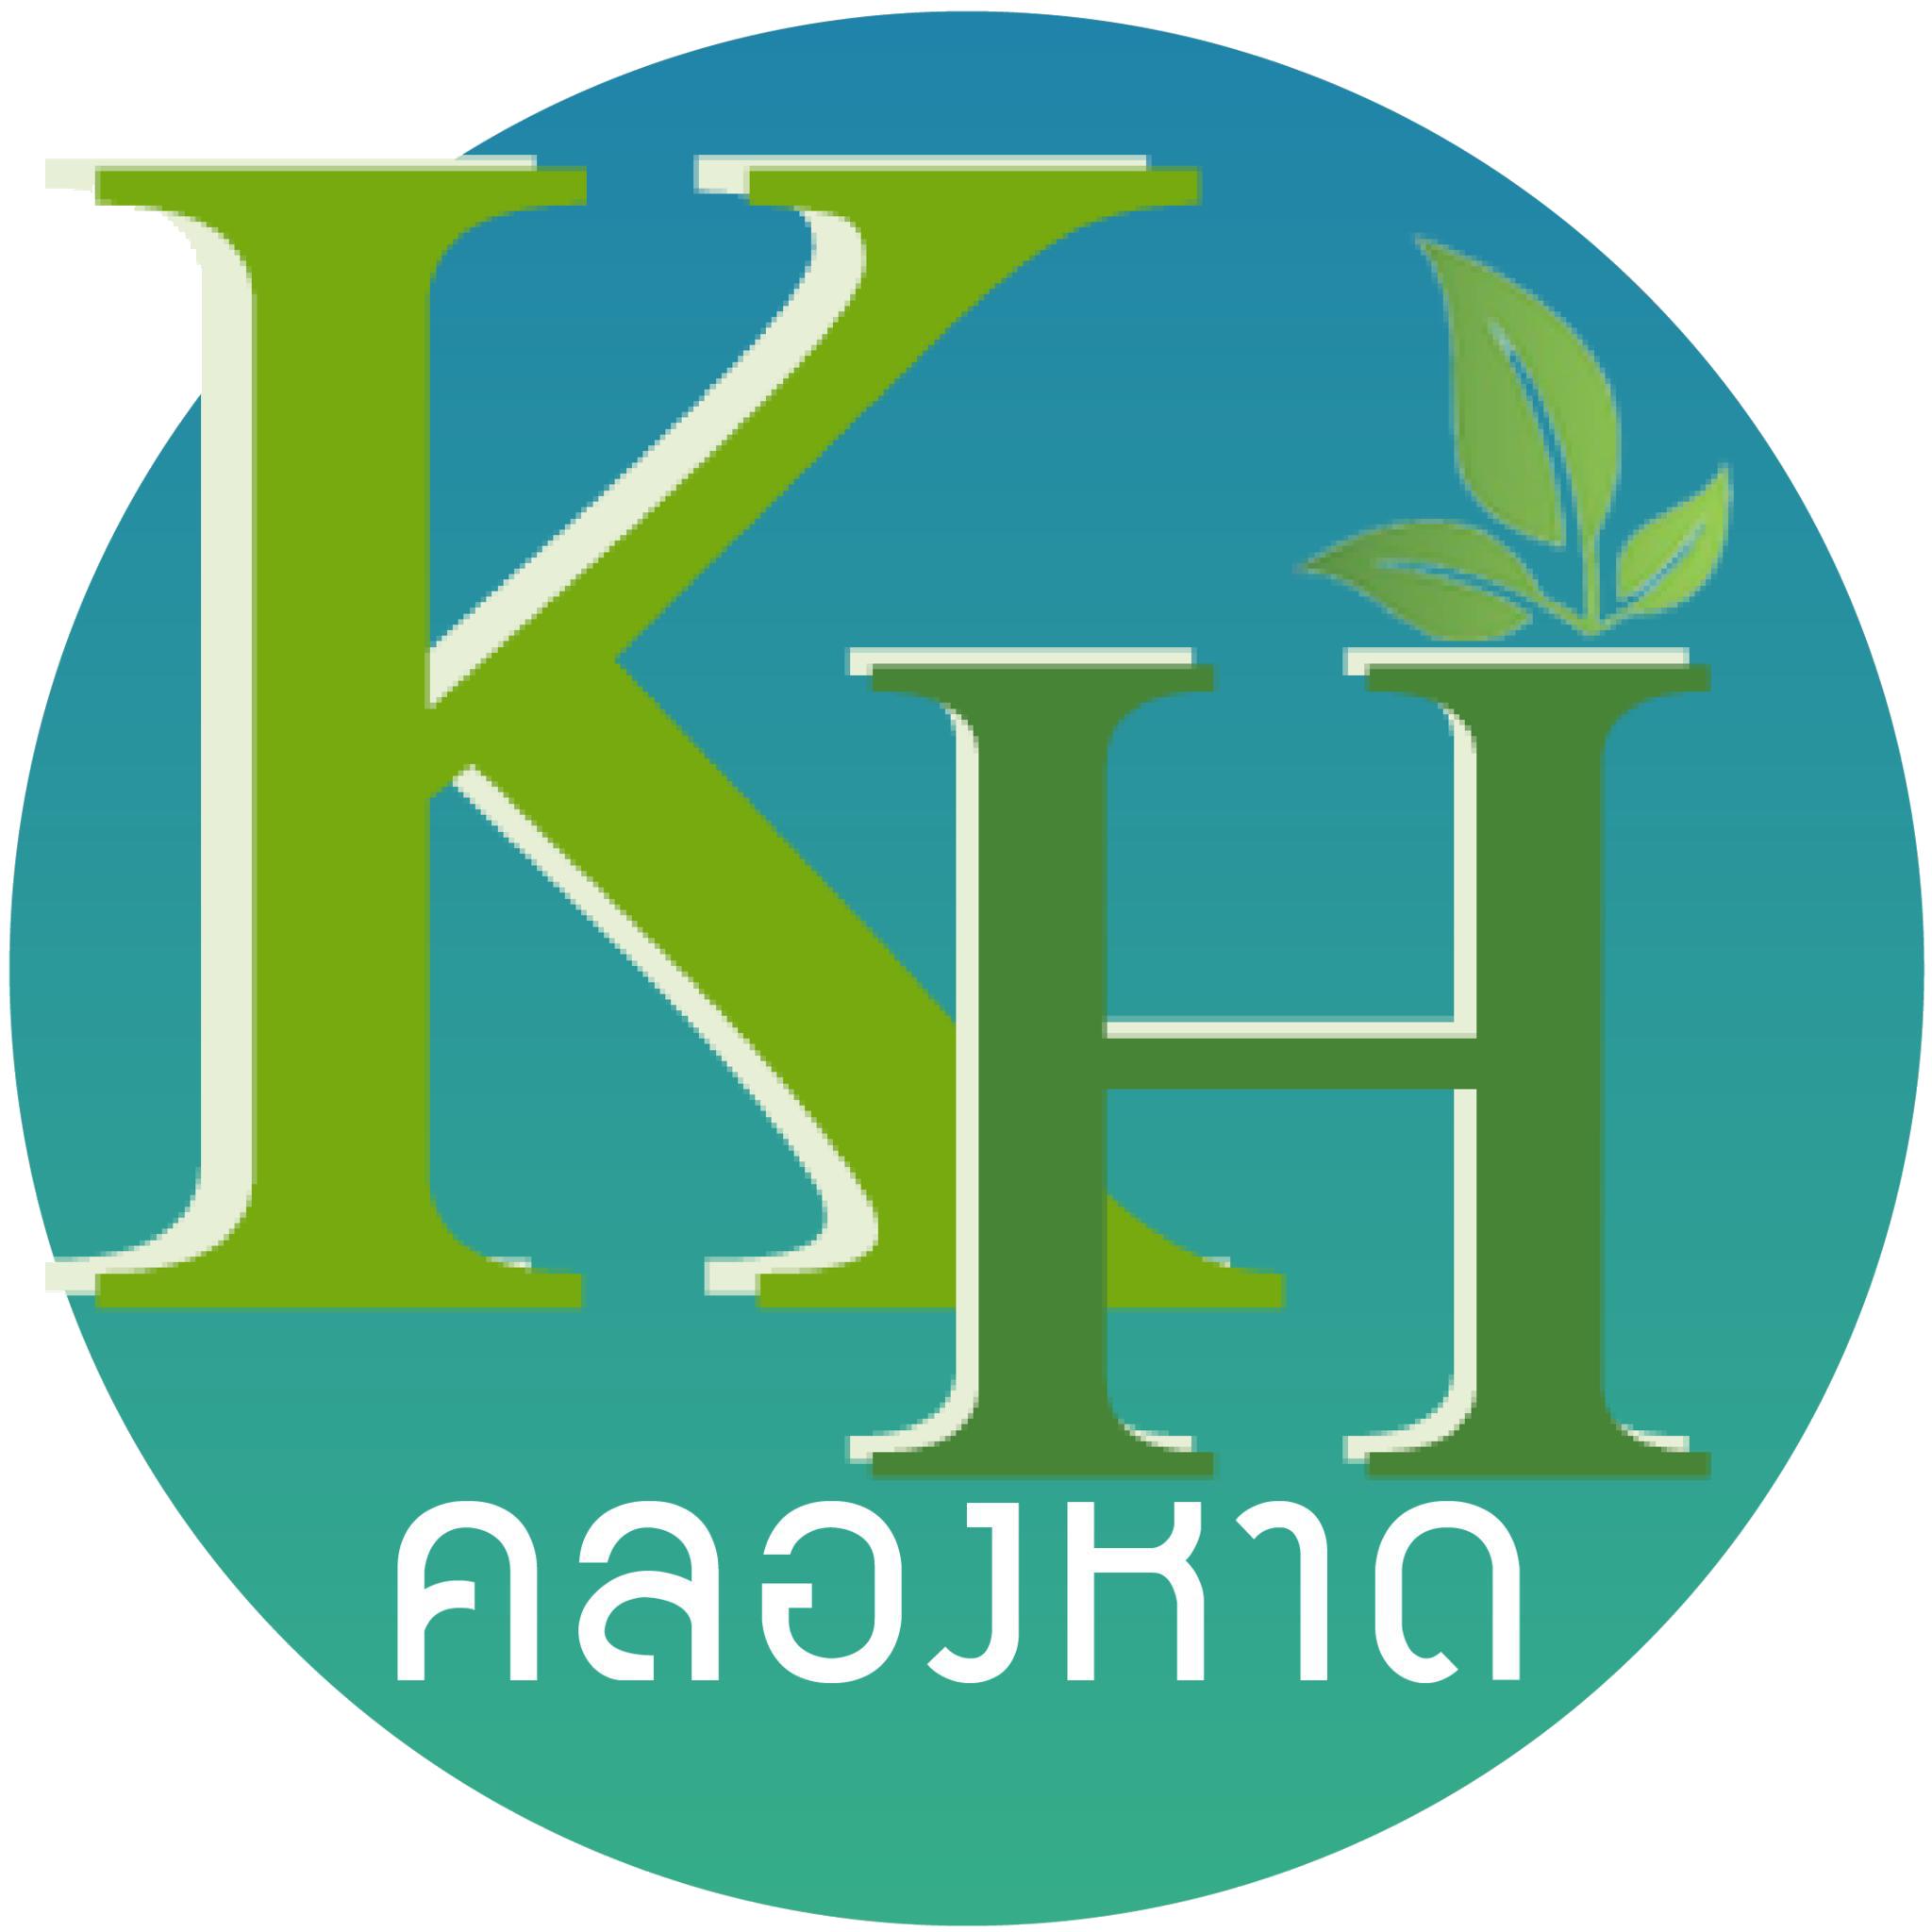 Khlong Hat - Keeate โมบายแอพสำเร็จรูป - รับทำแอพ iPhone, iPad (iOS), Android